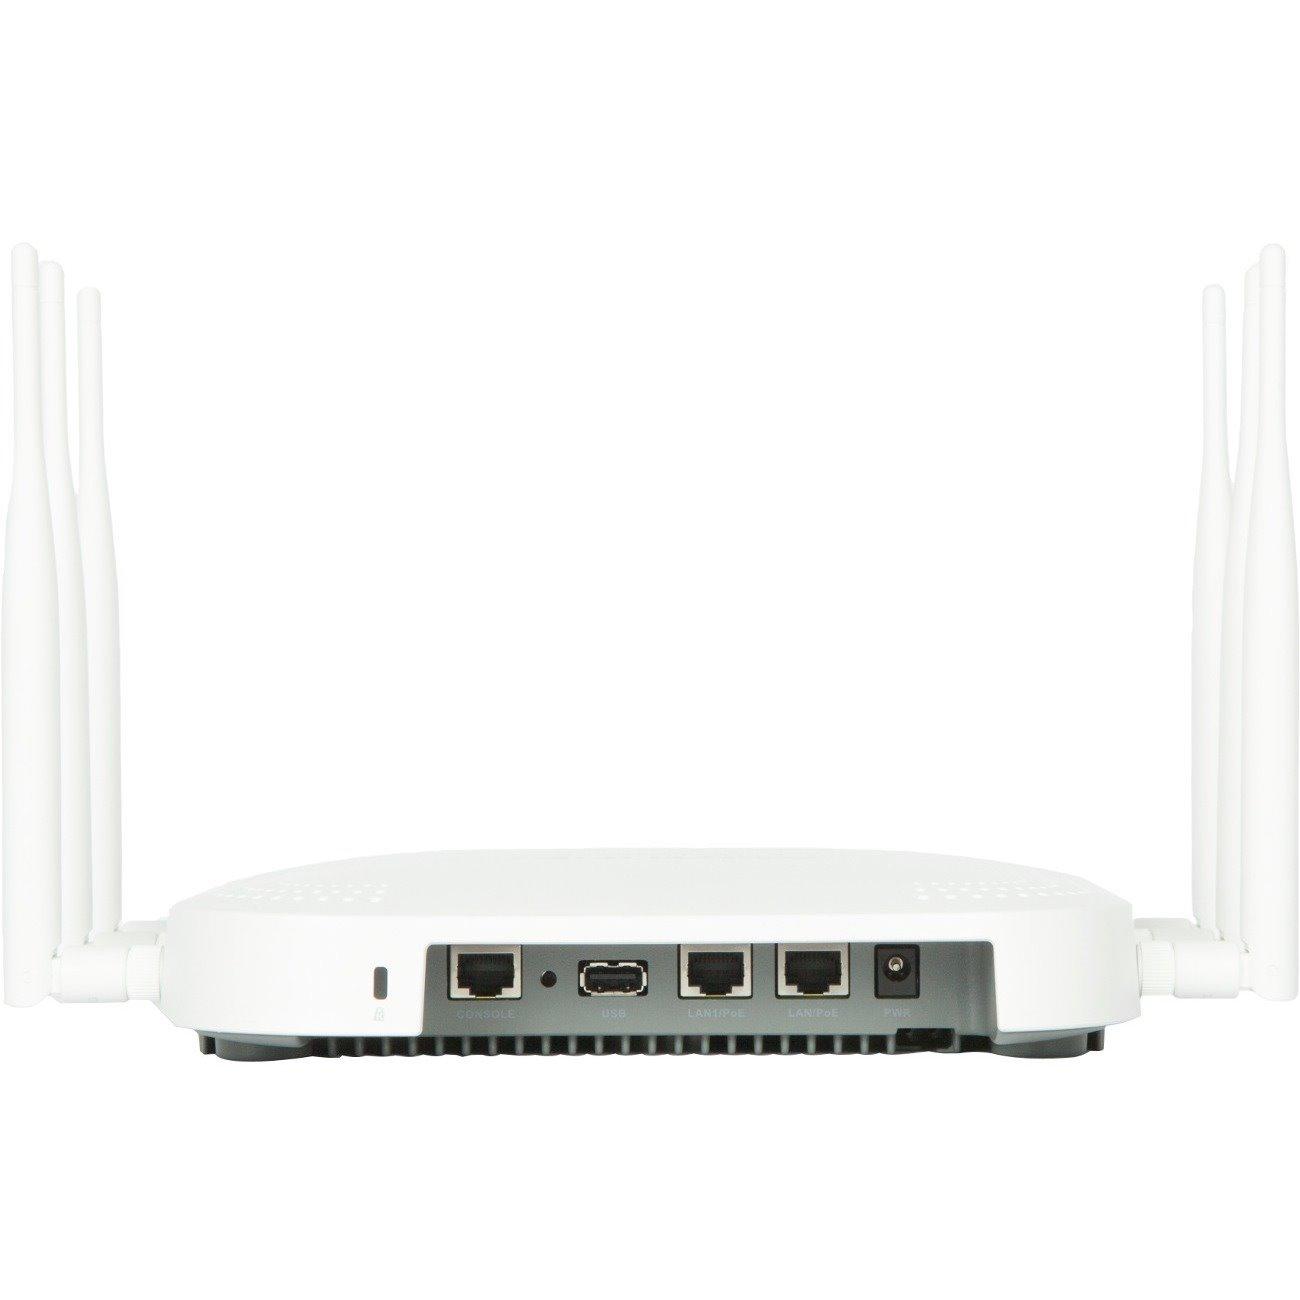 Fortinet FortiAP U323EV IEEE 802 11ac 2 72 Gbit/s Wireless Access Point